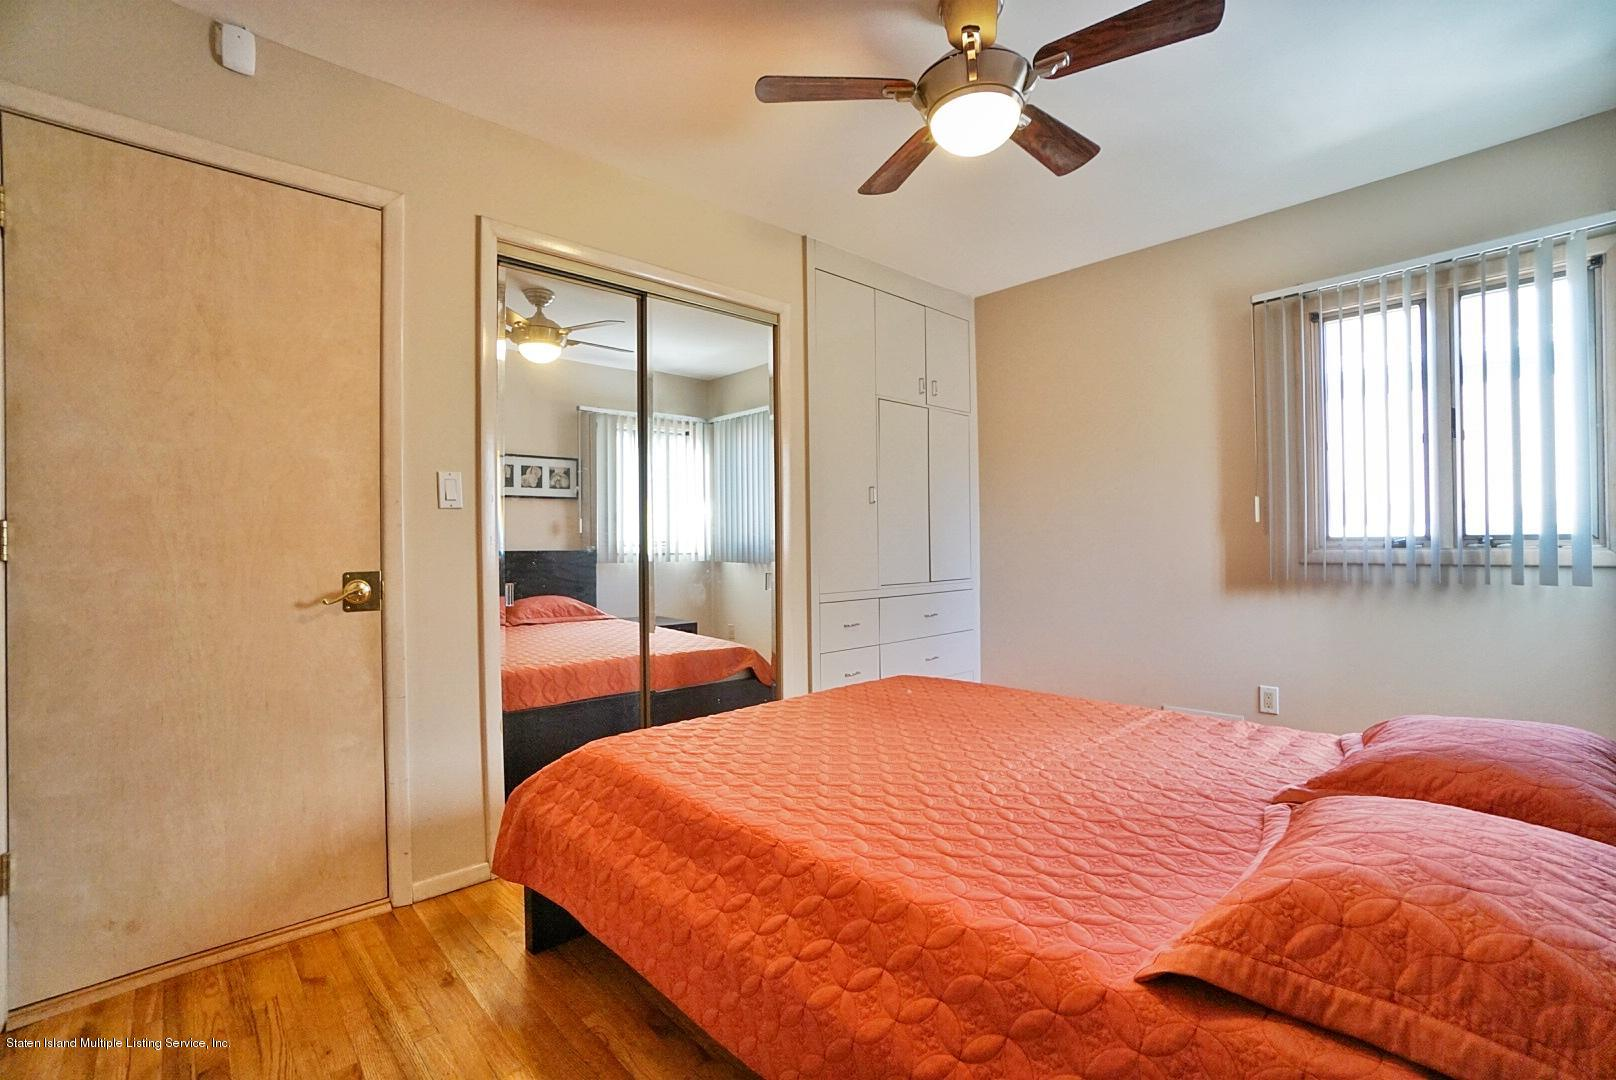 Single Family - Detached 183 Kensington Avenue  Staten Island, NY 10305, MLS-1127107-29